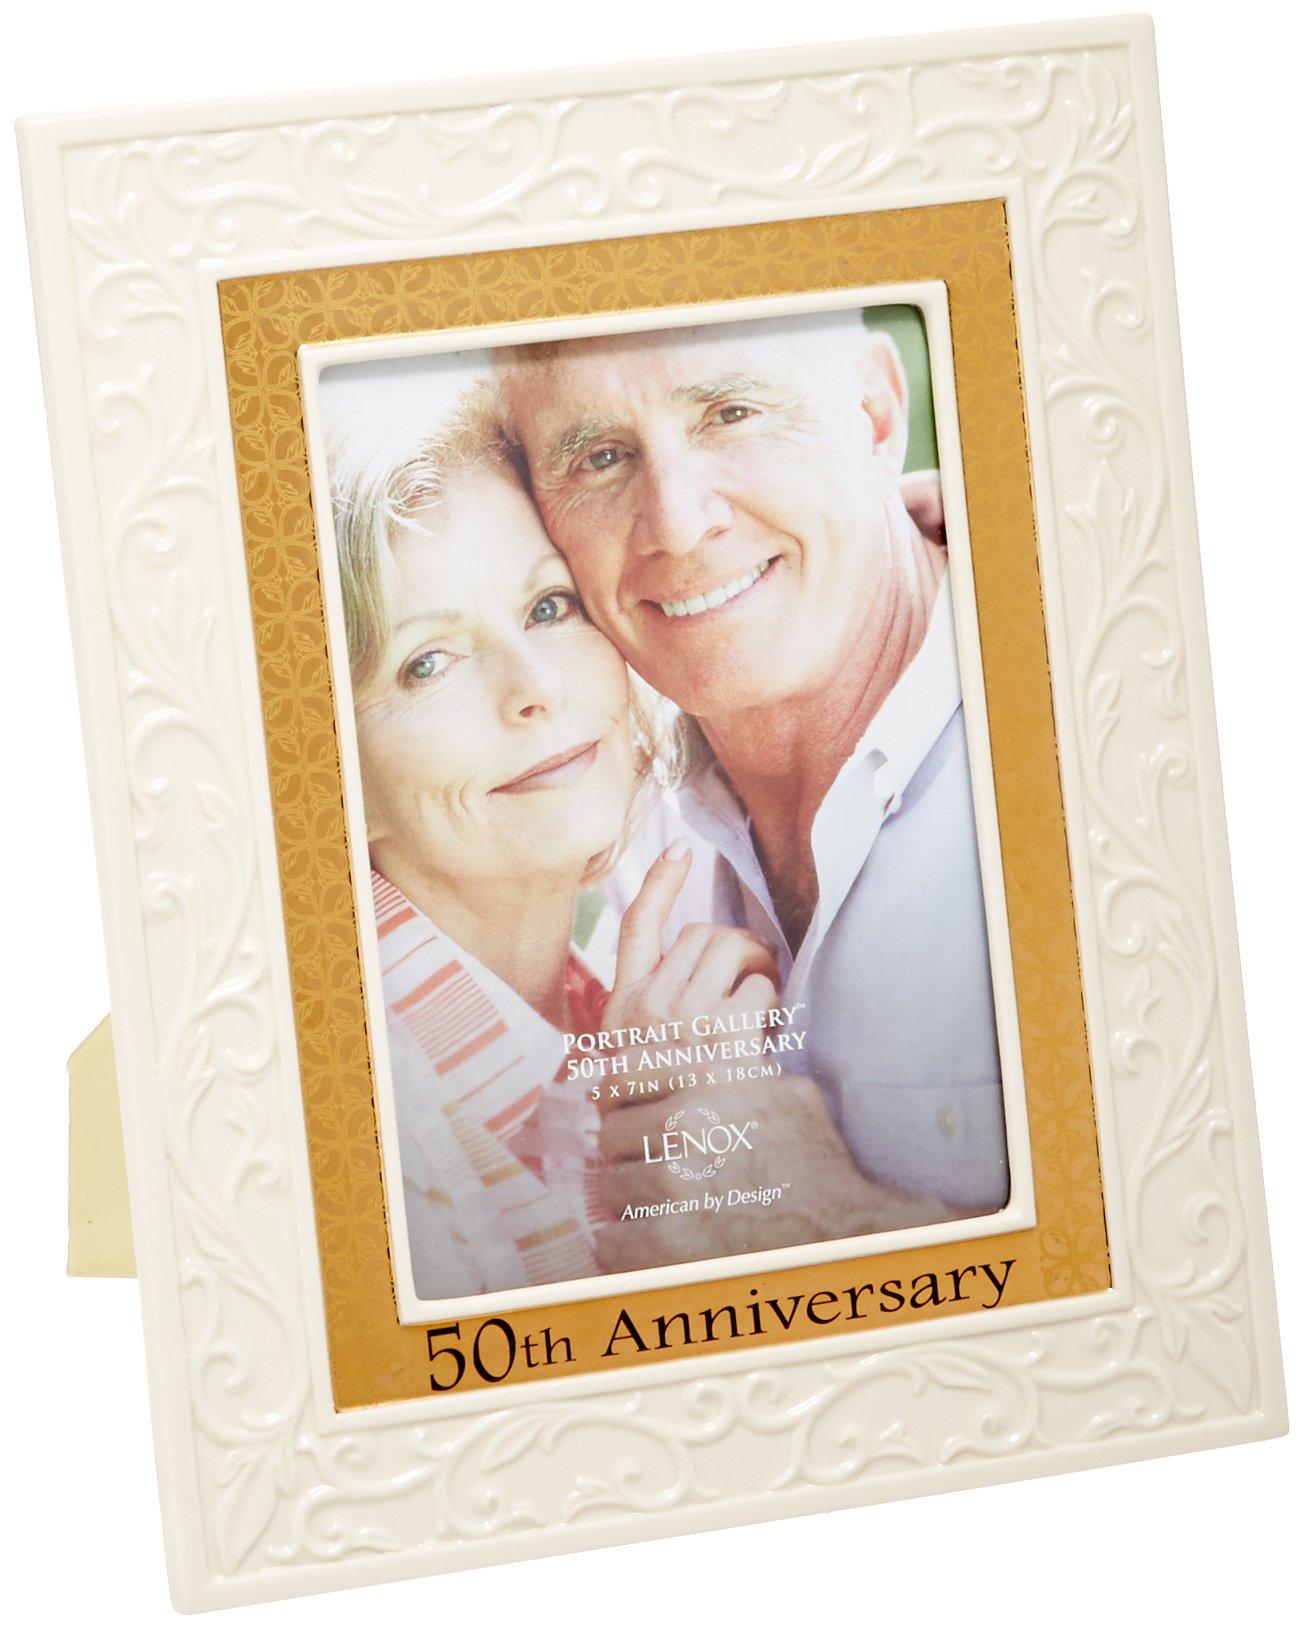 Lenox Portrait Gallery 50th Anniversary Luxury Frame, 5 by 7-Inch